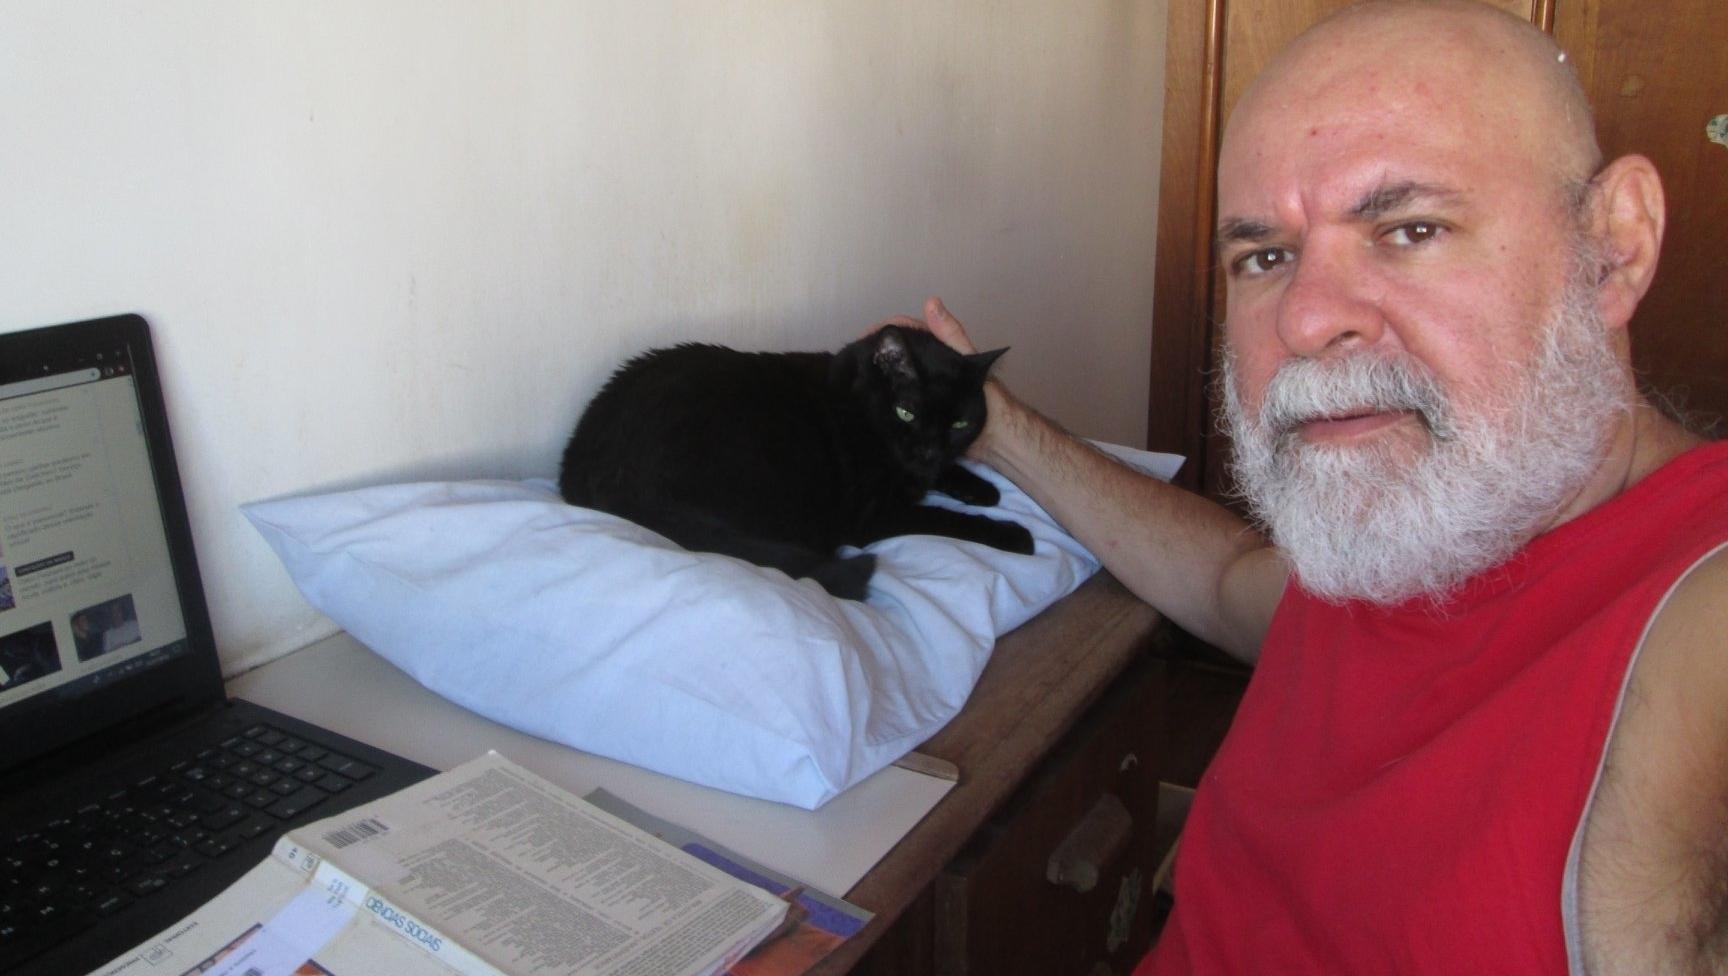 Goiano ganha prêmio de literatura da Livraria Lello de Porto, Portugal